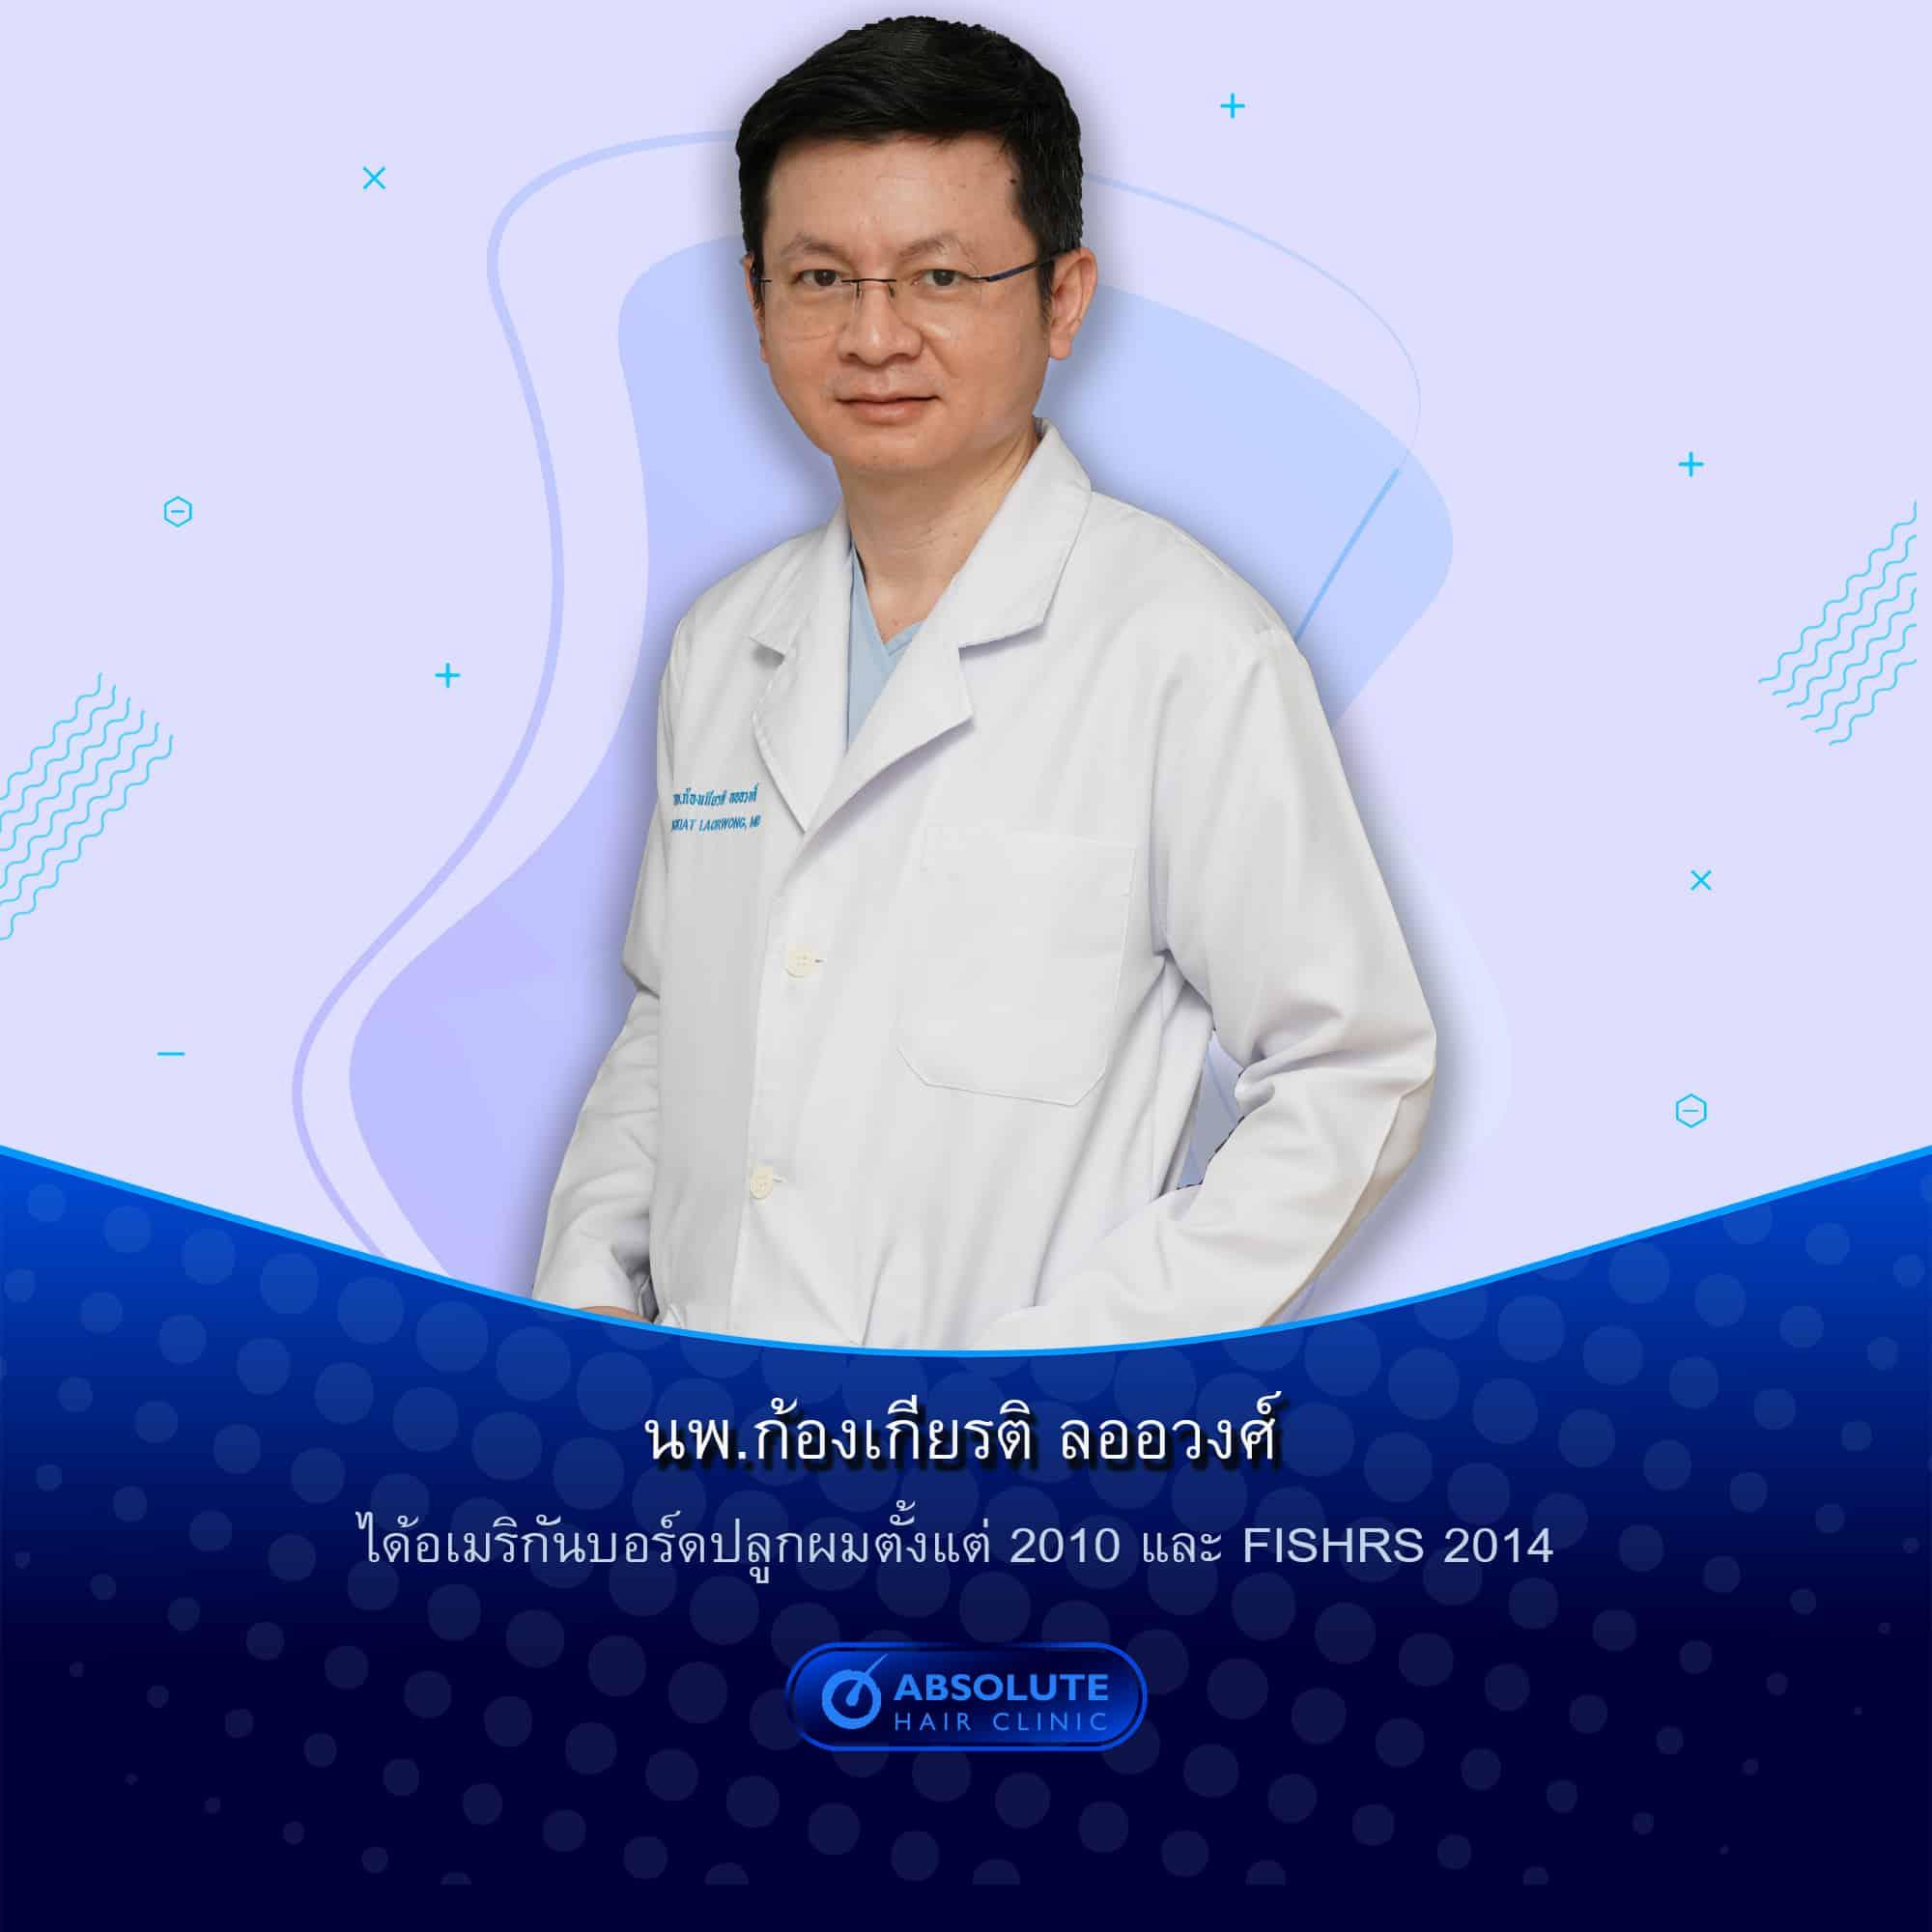 Dr.Kongkiat Laorwong.MD,FISHRS